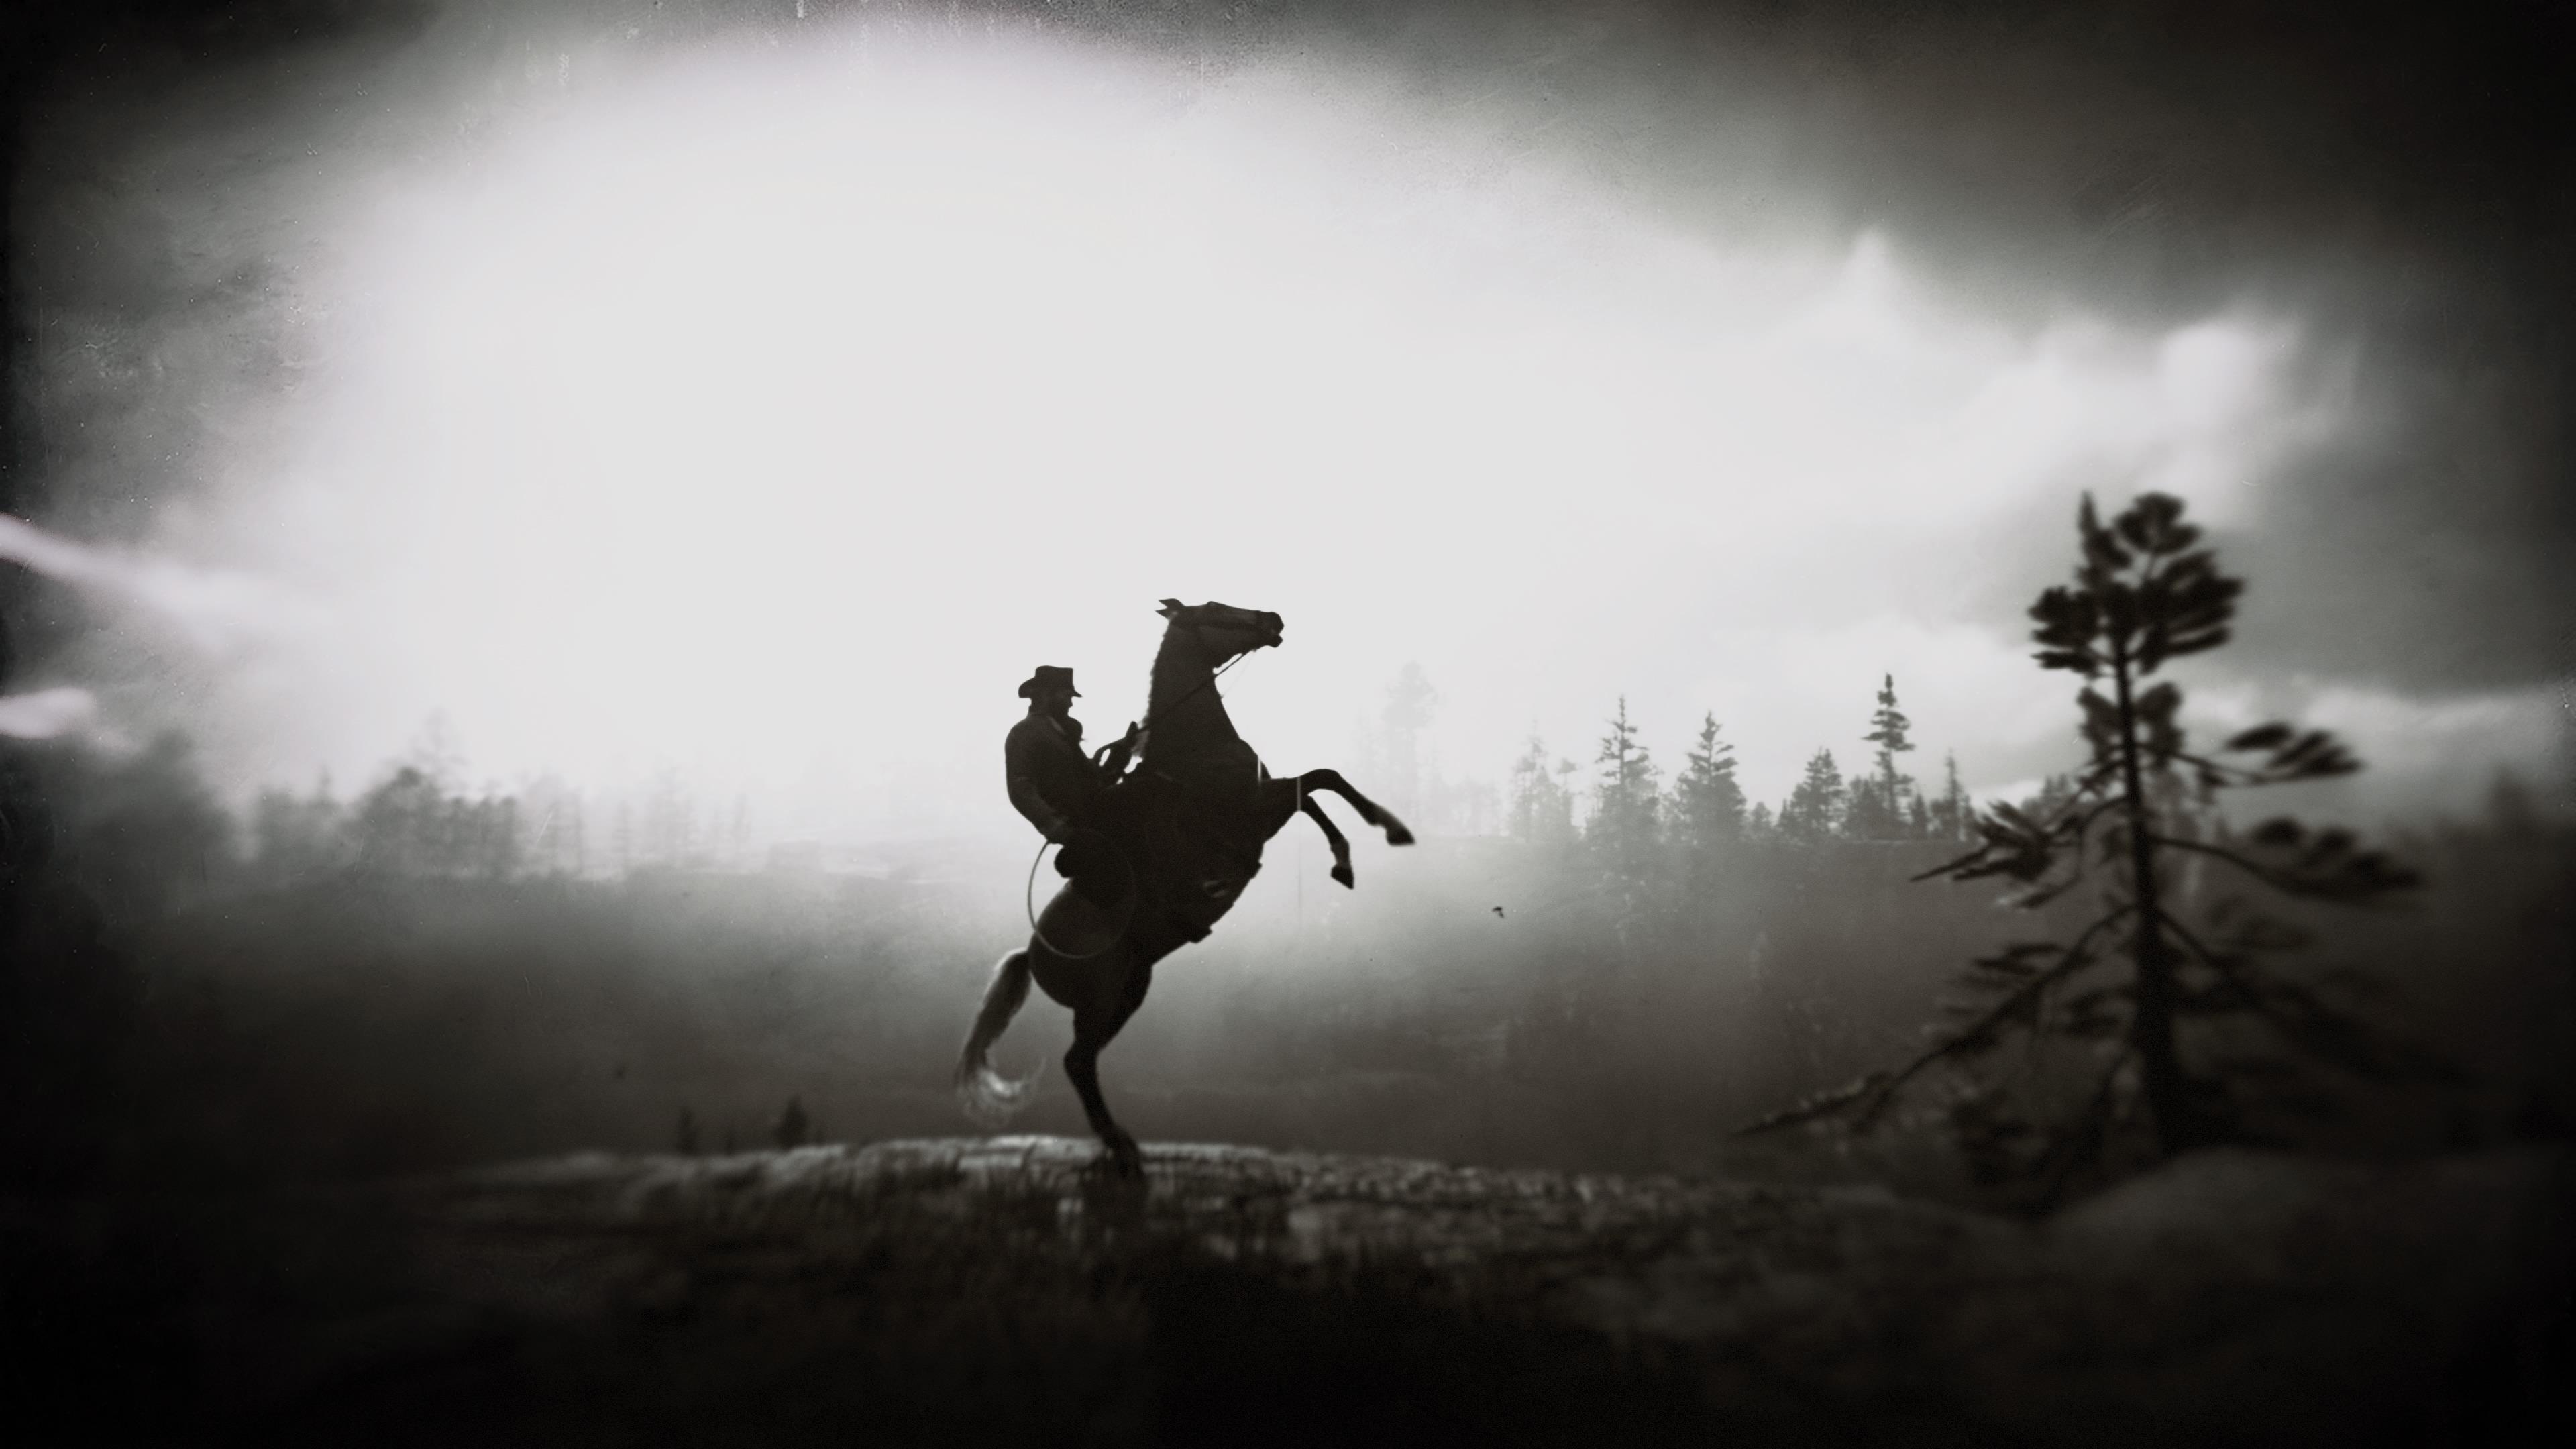 Red Dead Redemption 2 Horse Ride 4k, HD Games, 4k ...